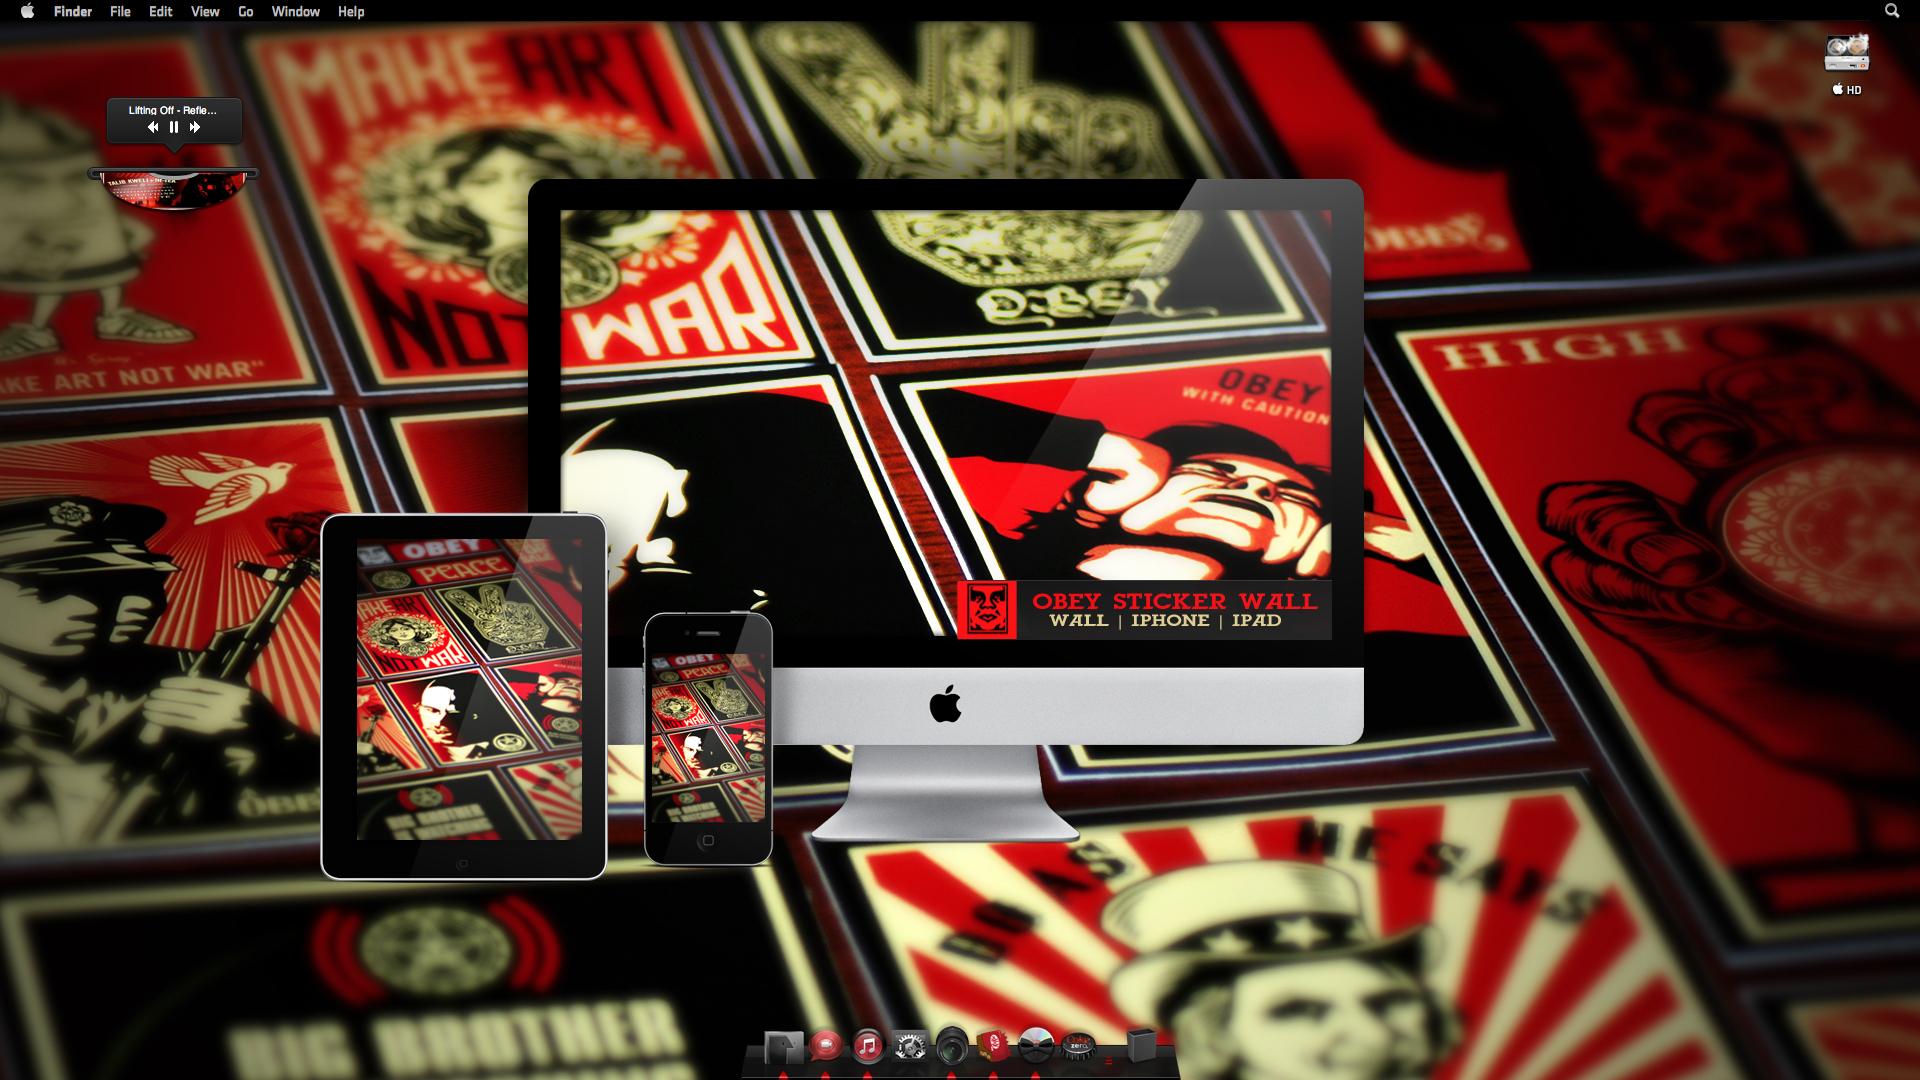 Obey Iphone Wallpaper Obey sticker w 1920x1080